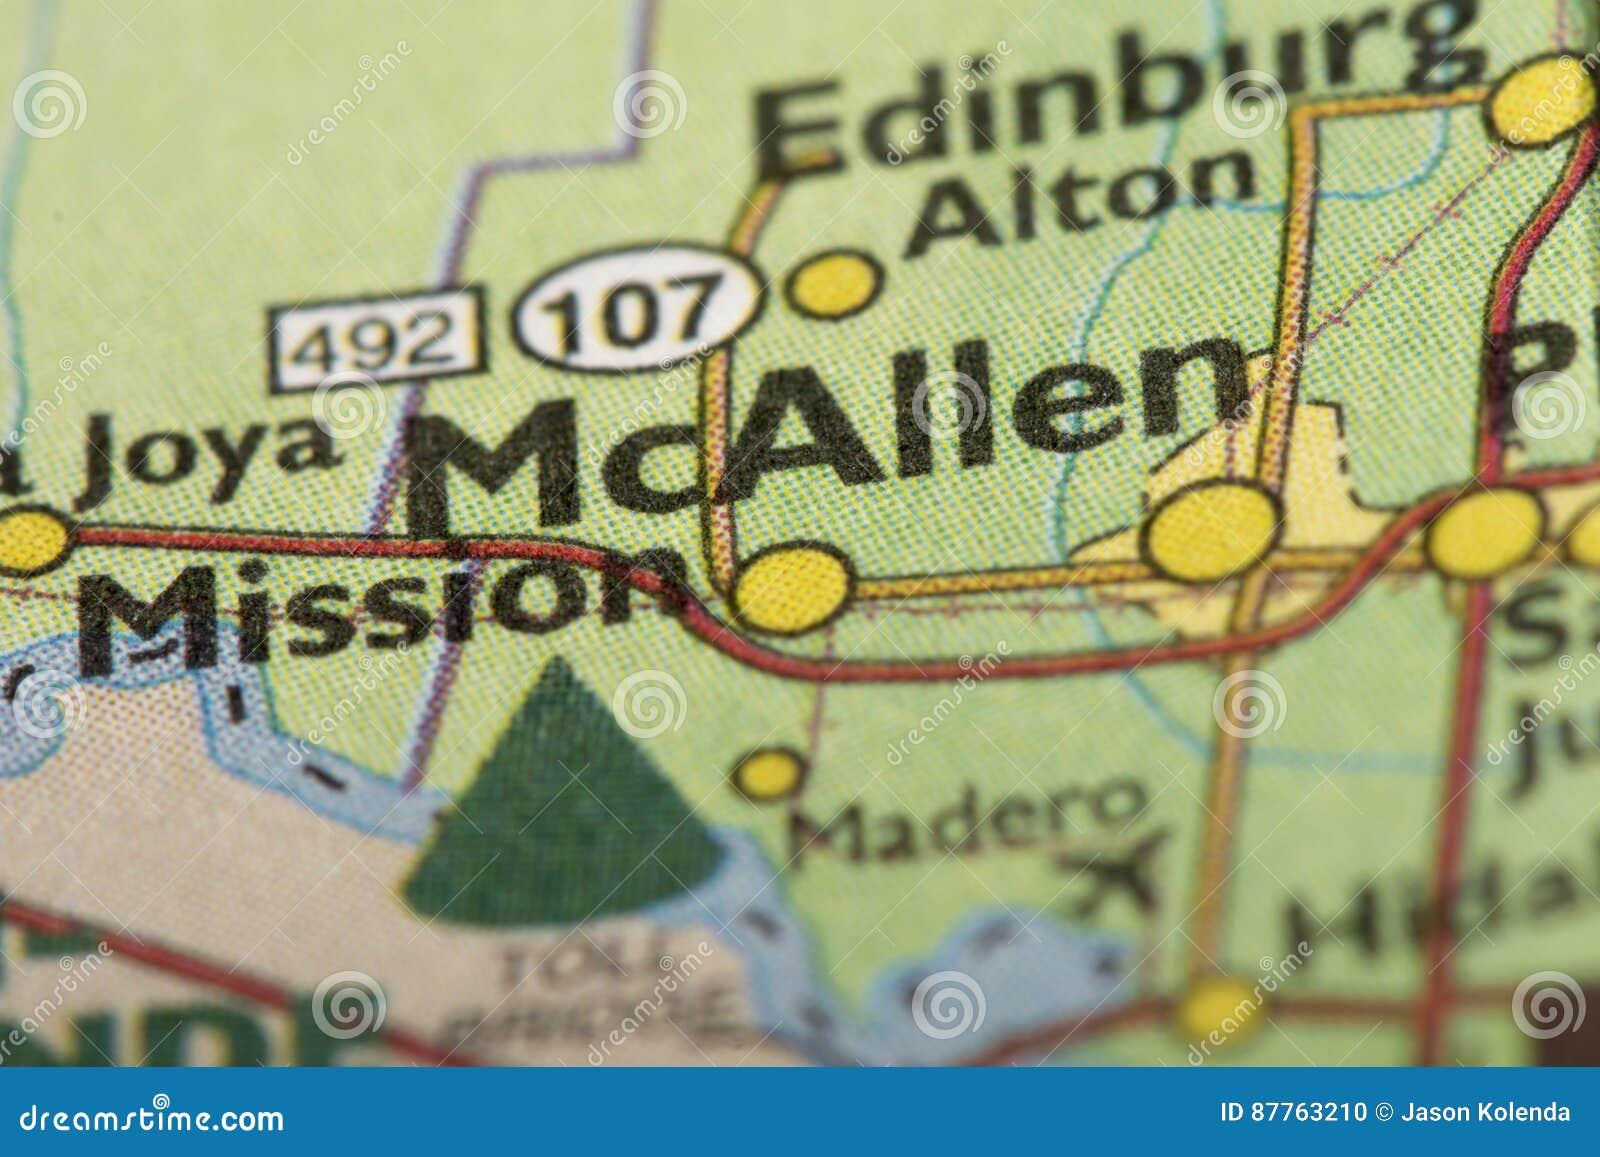 Mcallen Texas On Map Stock Photo Image Of World Tourism 87763210